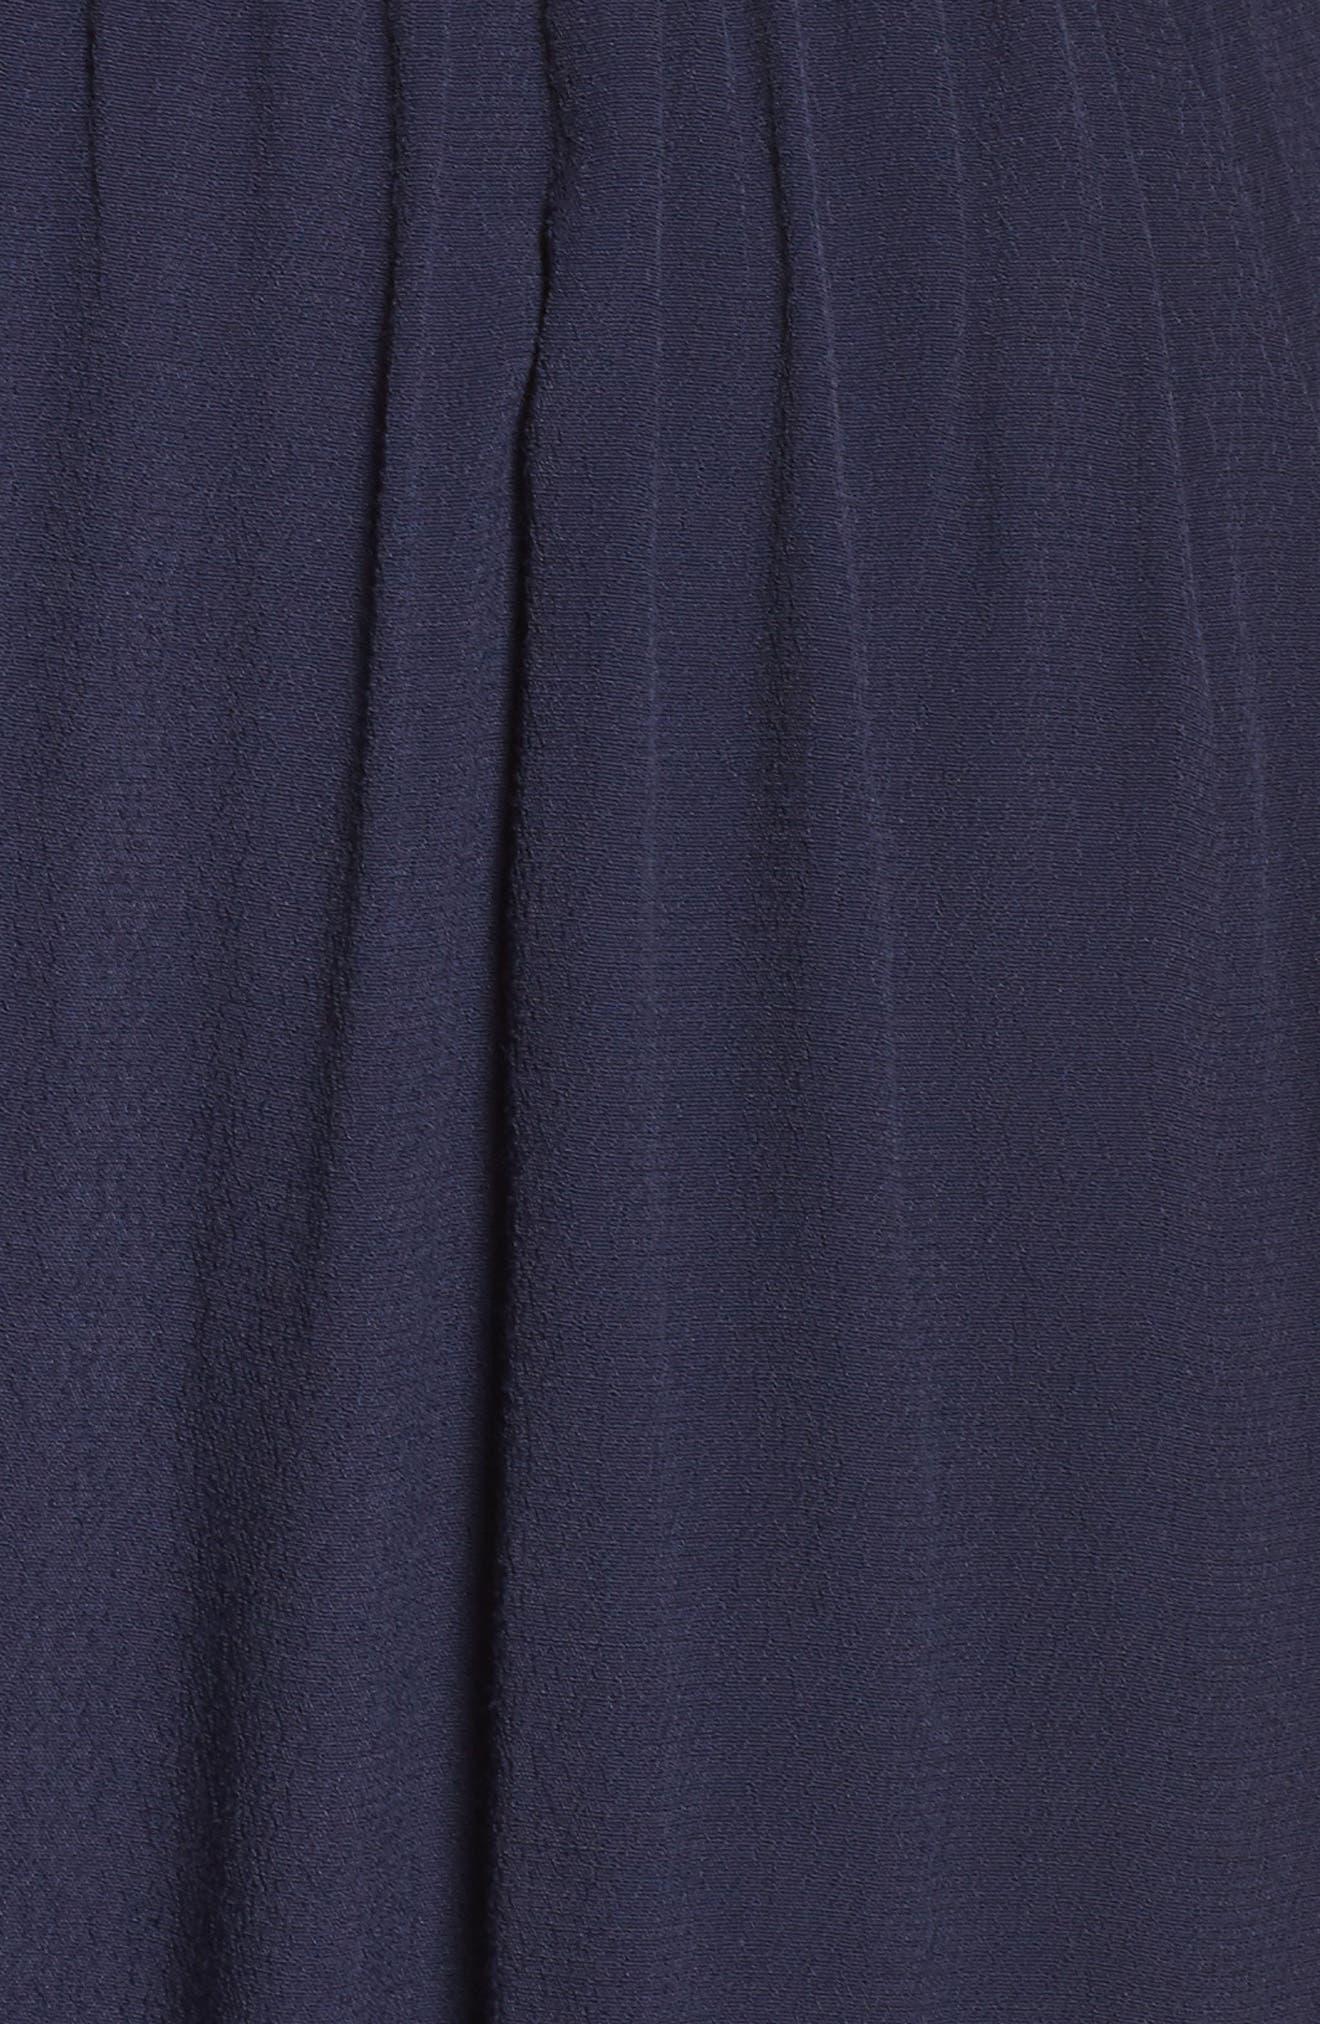 Cold Shoulder Jumpsuit,                             Alternate thumbnail 5, color,                             Navy